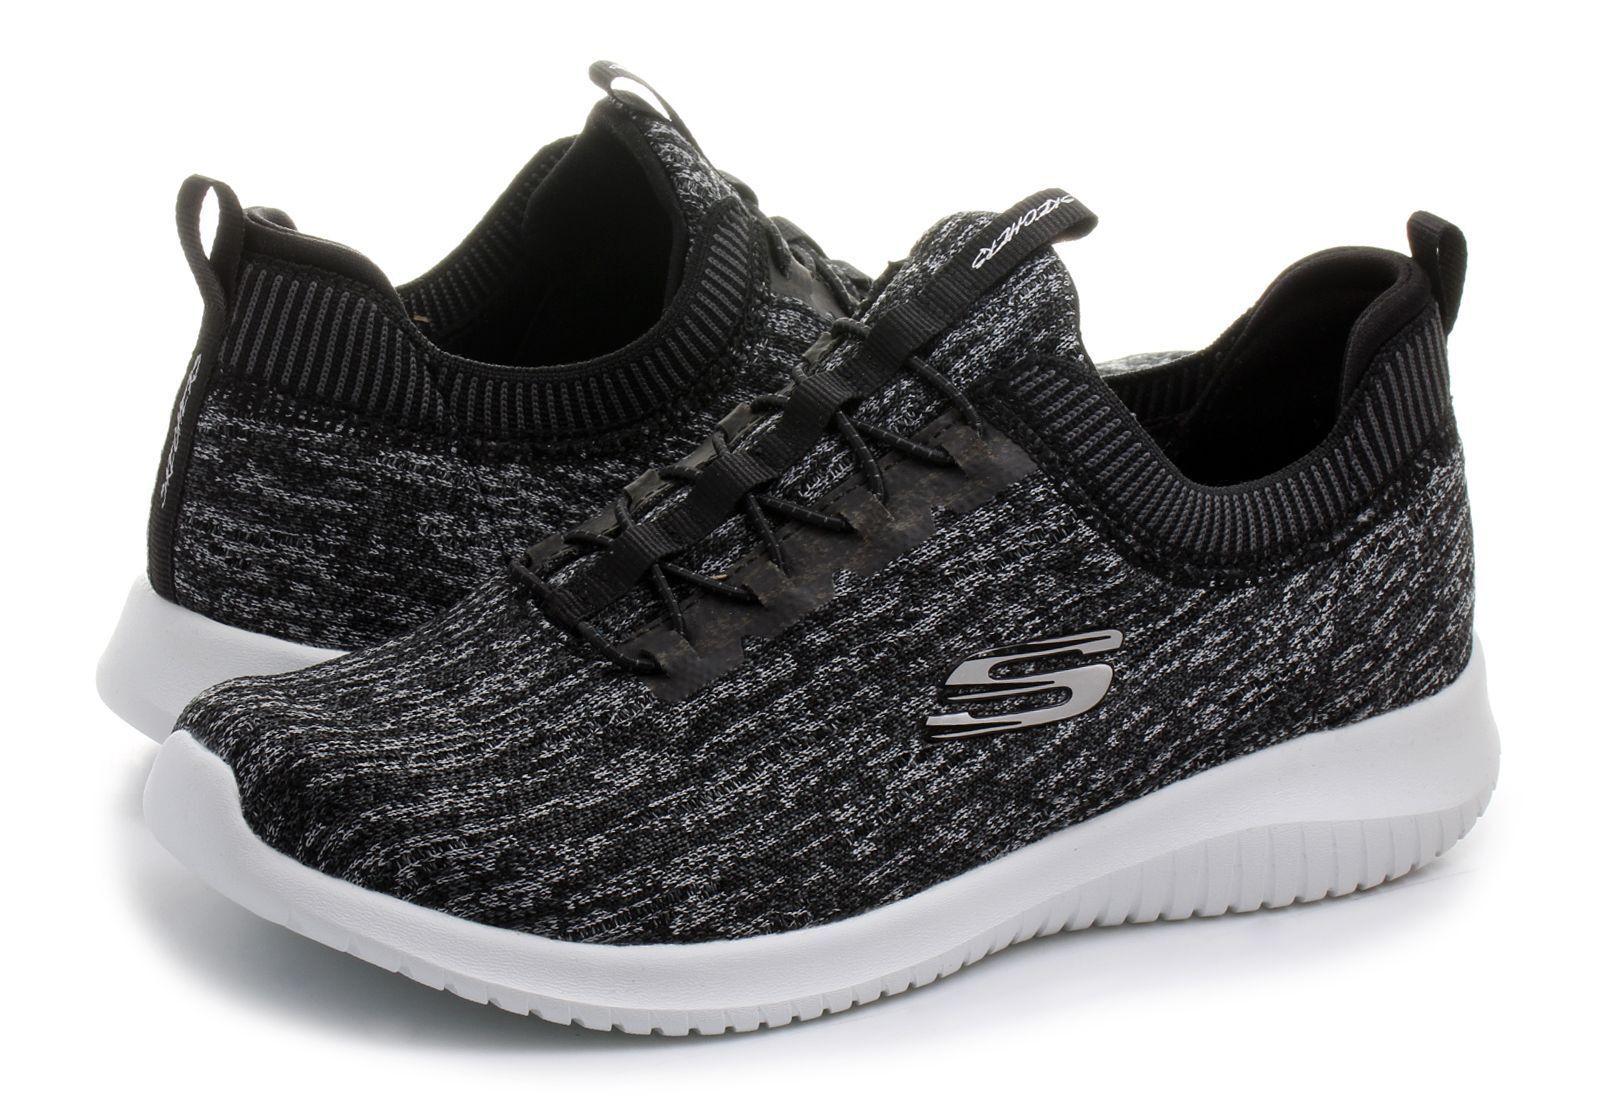 Skechers Ultra  Flex Womens Running Slip on Trainer  Walking shoes - Black Grey